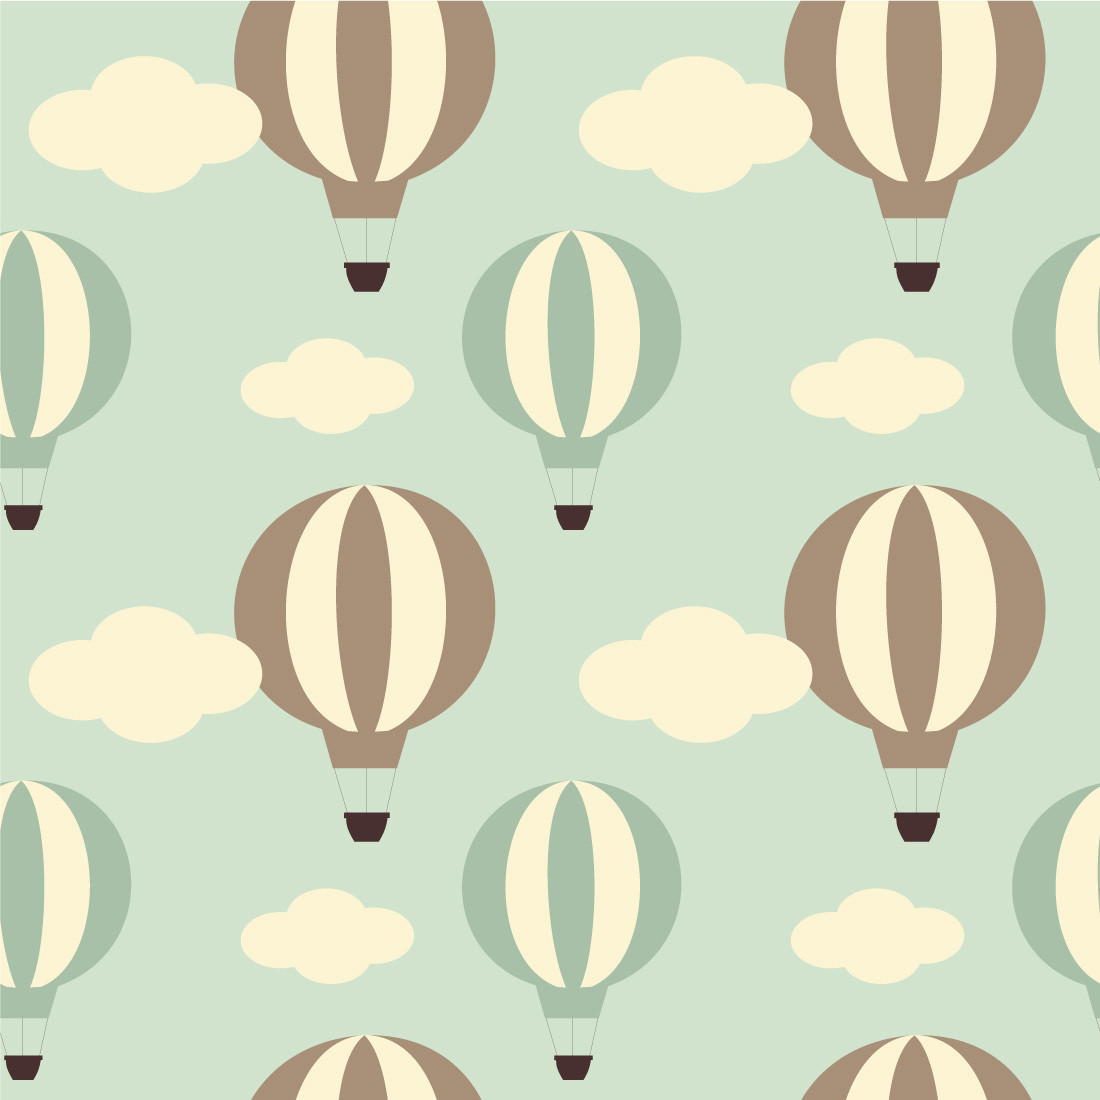 Papel de Parede Minimalista Balões